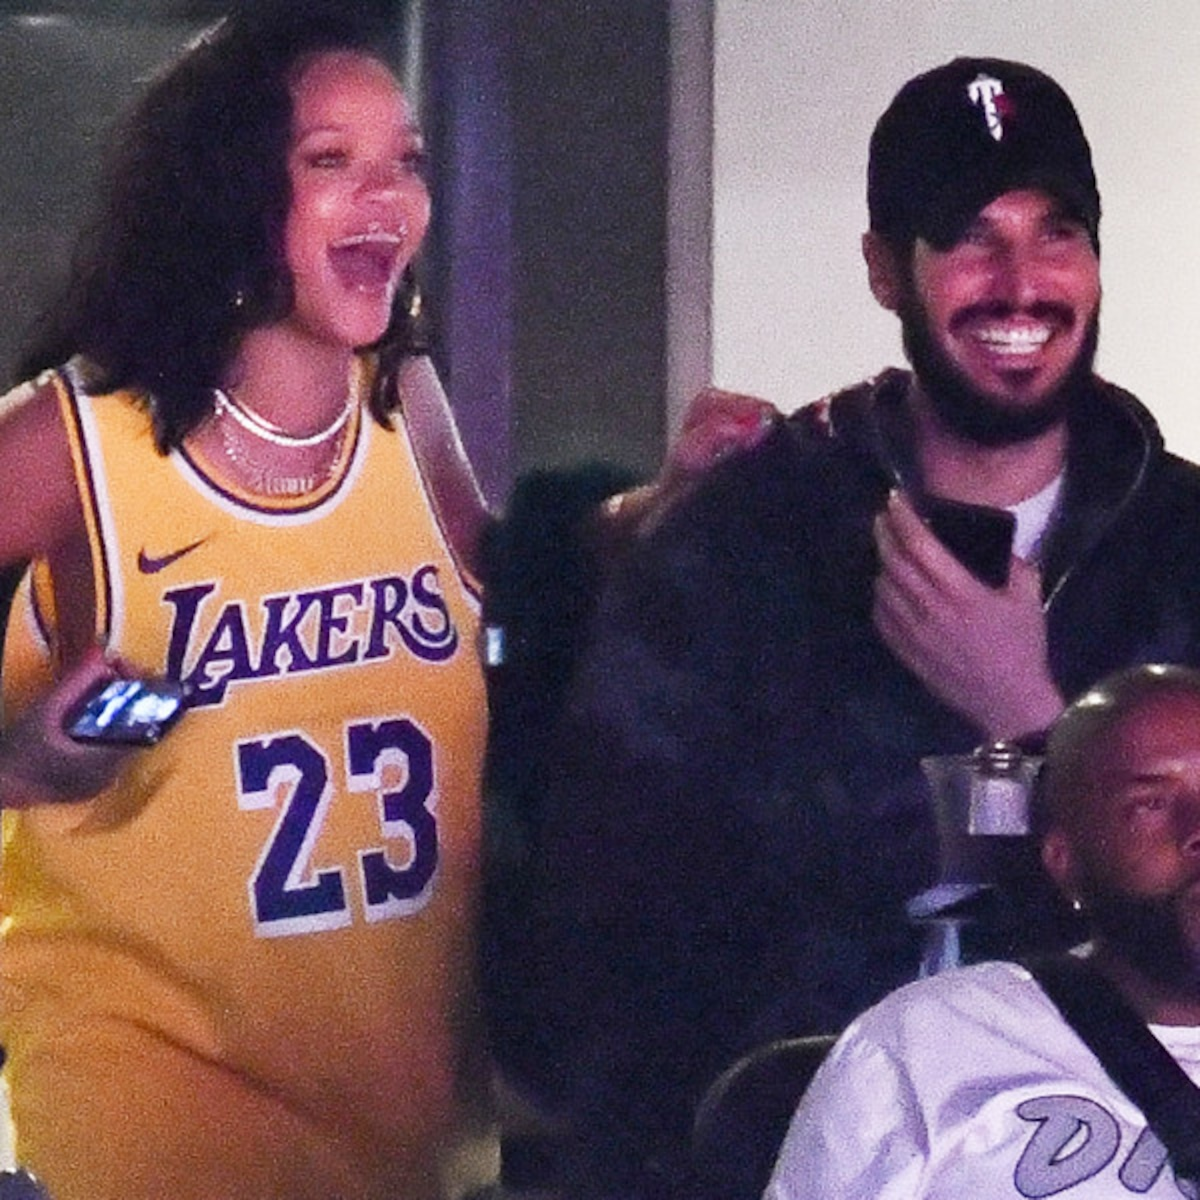 Boyfriend rihanna new Rihanna Boyfriend